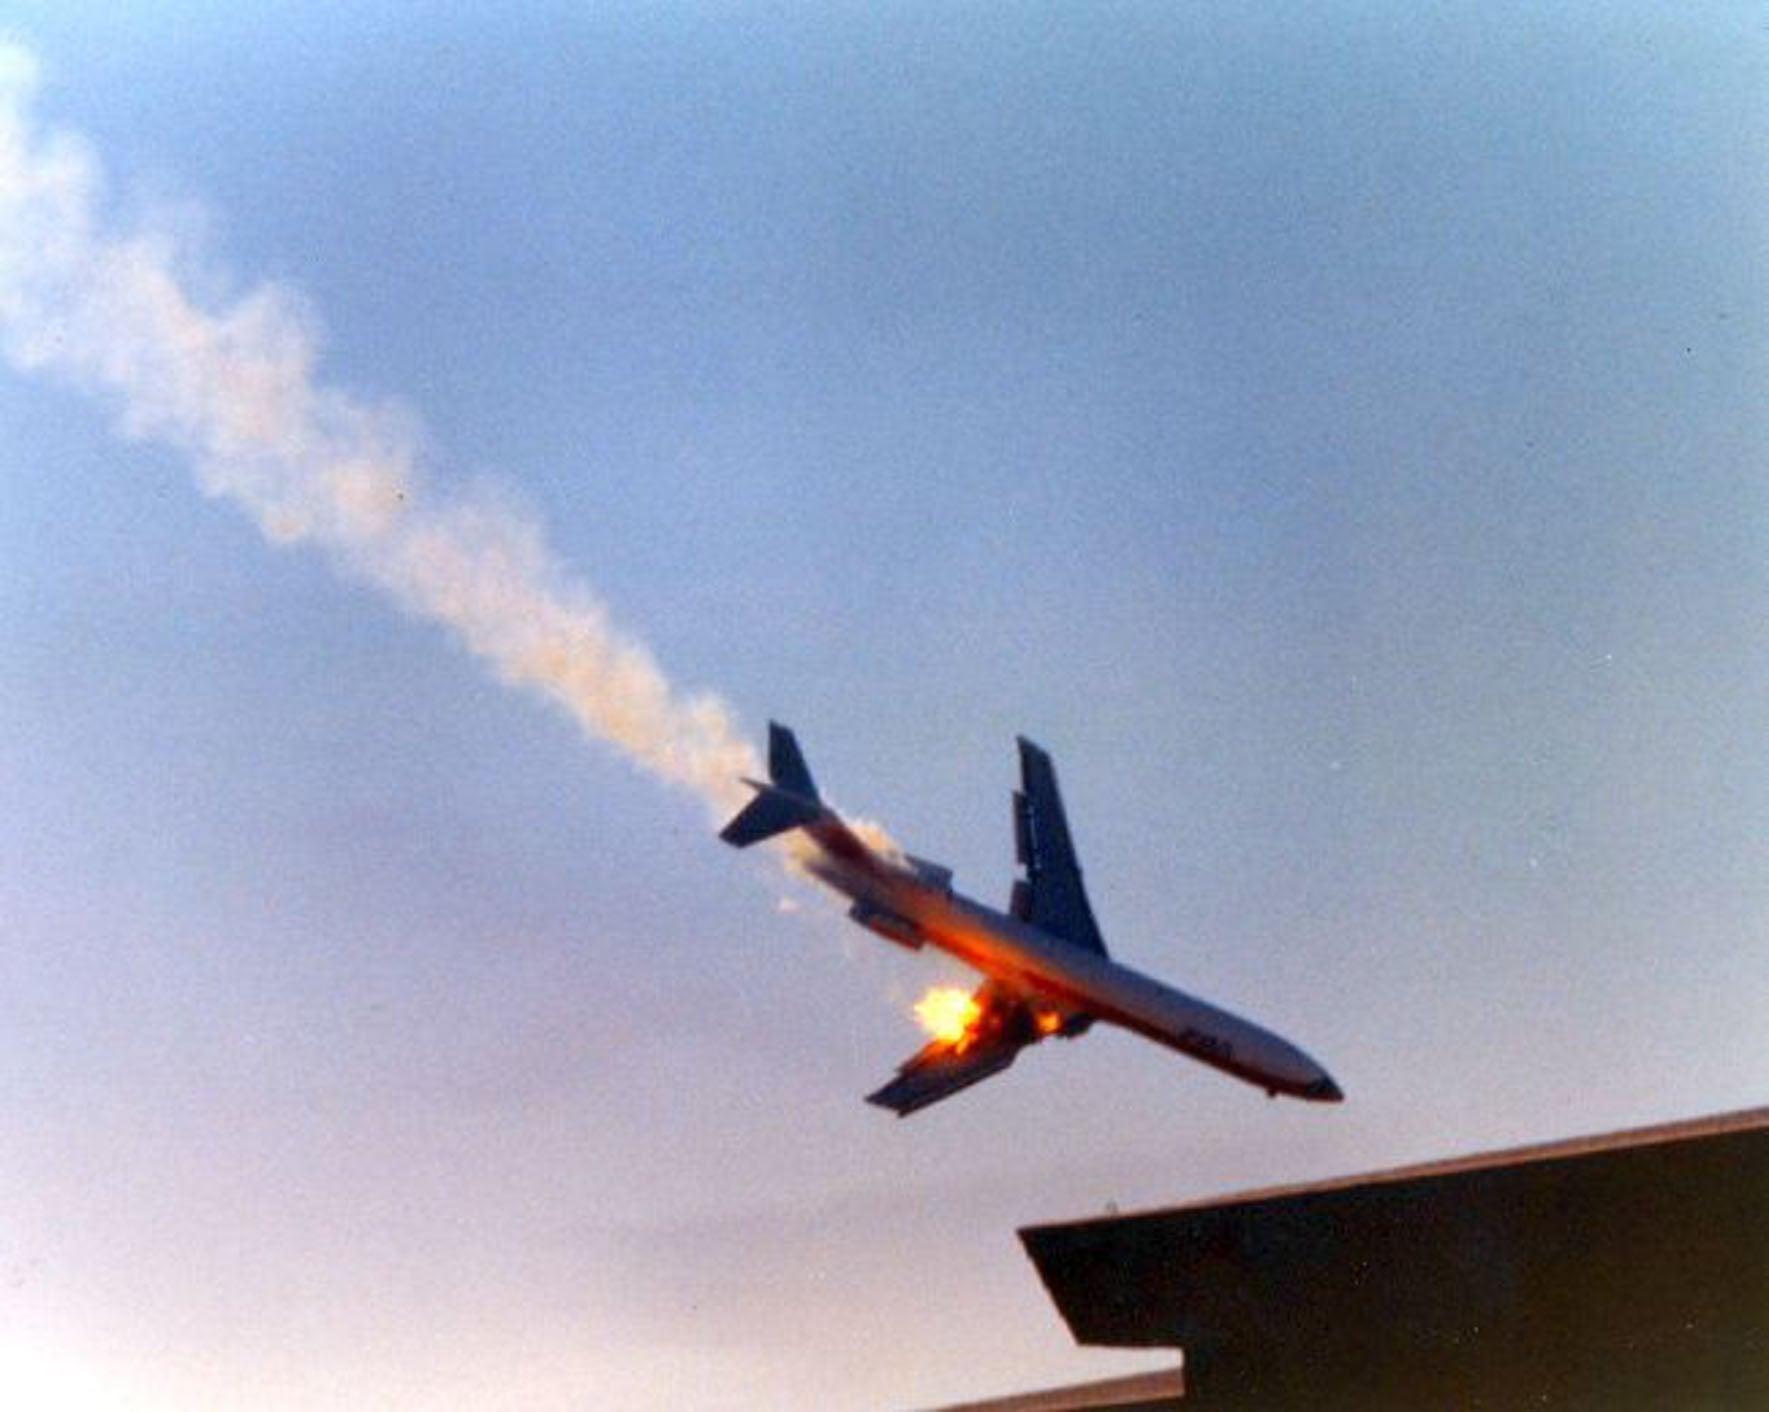 PSA Flight 182 crash: how a routine commuter flight turned